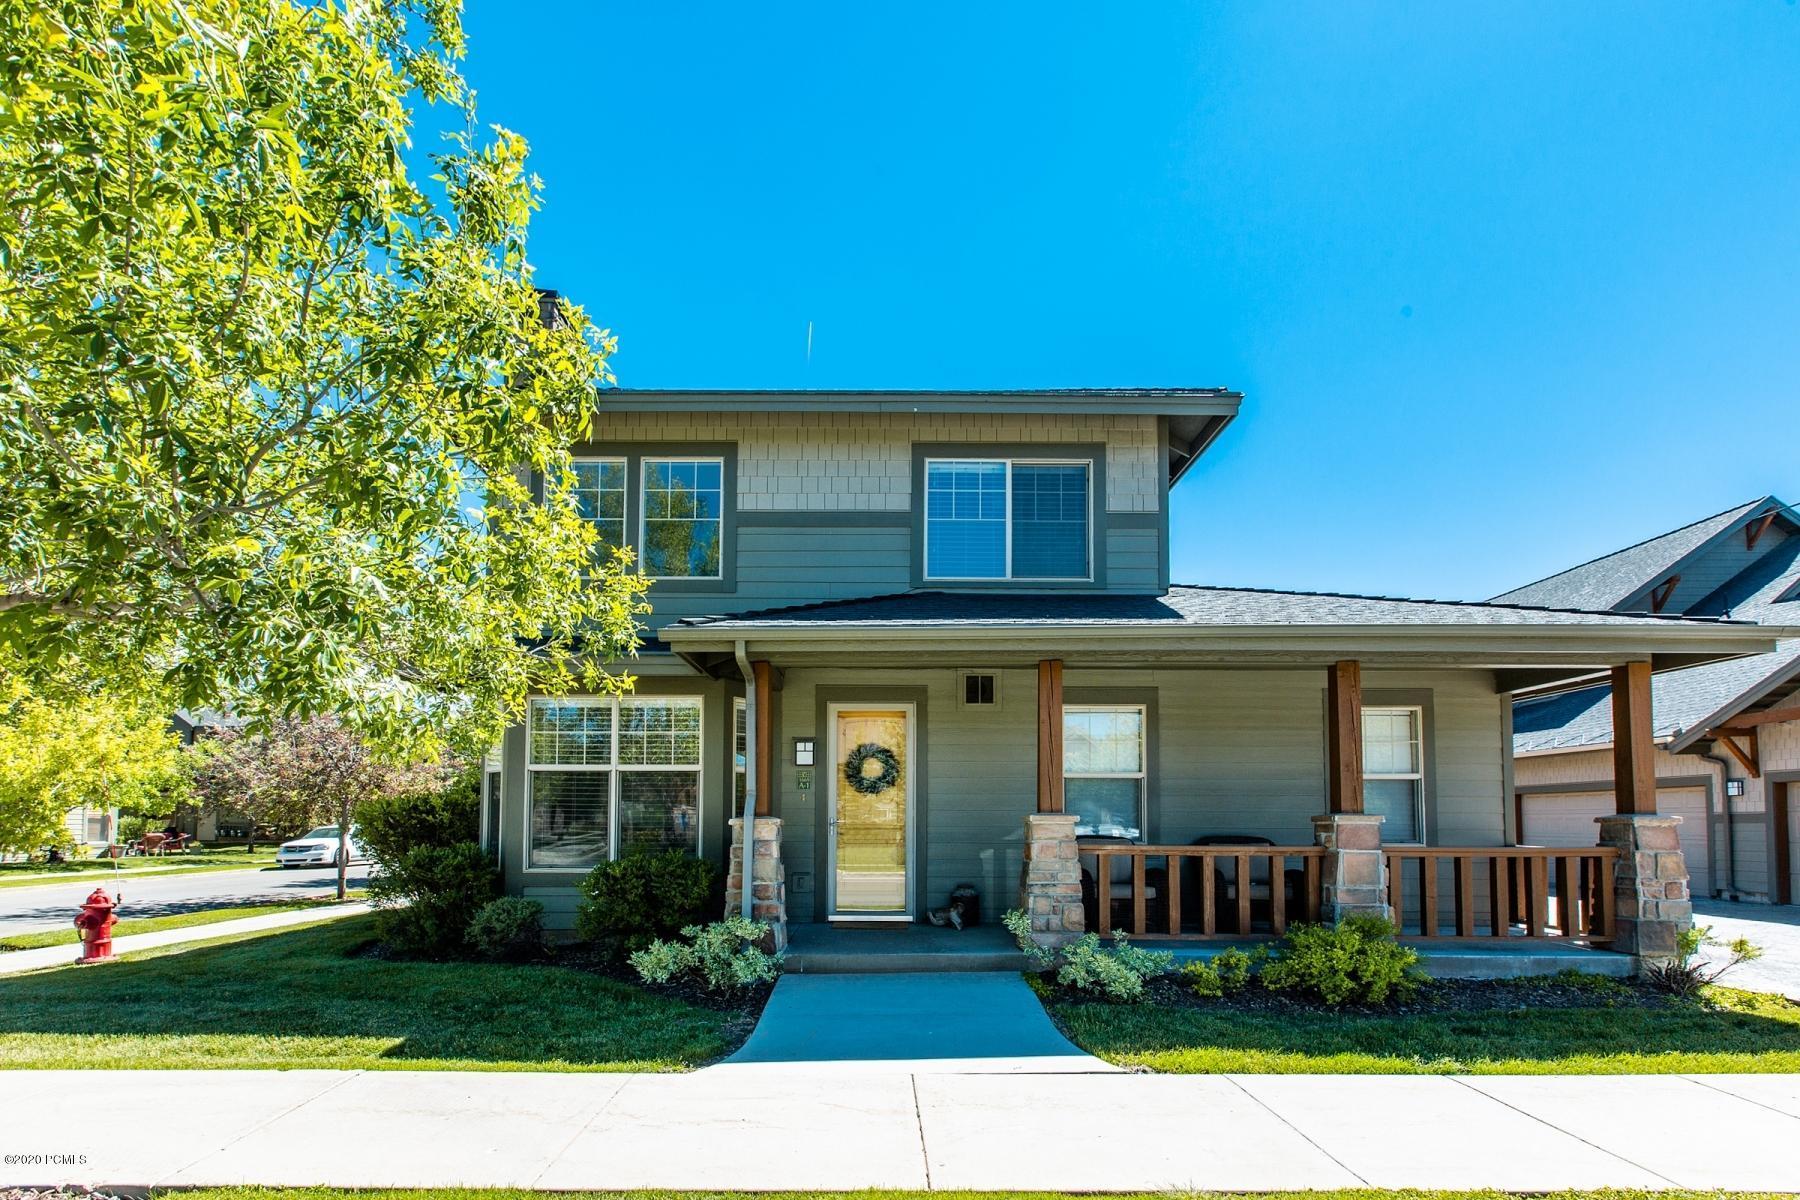 1669 West Redstone Avenue A1, Park City, Utah 84098, 2 Bedrooms Bedrooms, ,3 BathroomsBathrooms,Condominium,For Sale,West Redstone Avenue A1,20190109112430415765000000